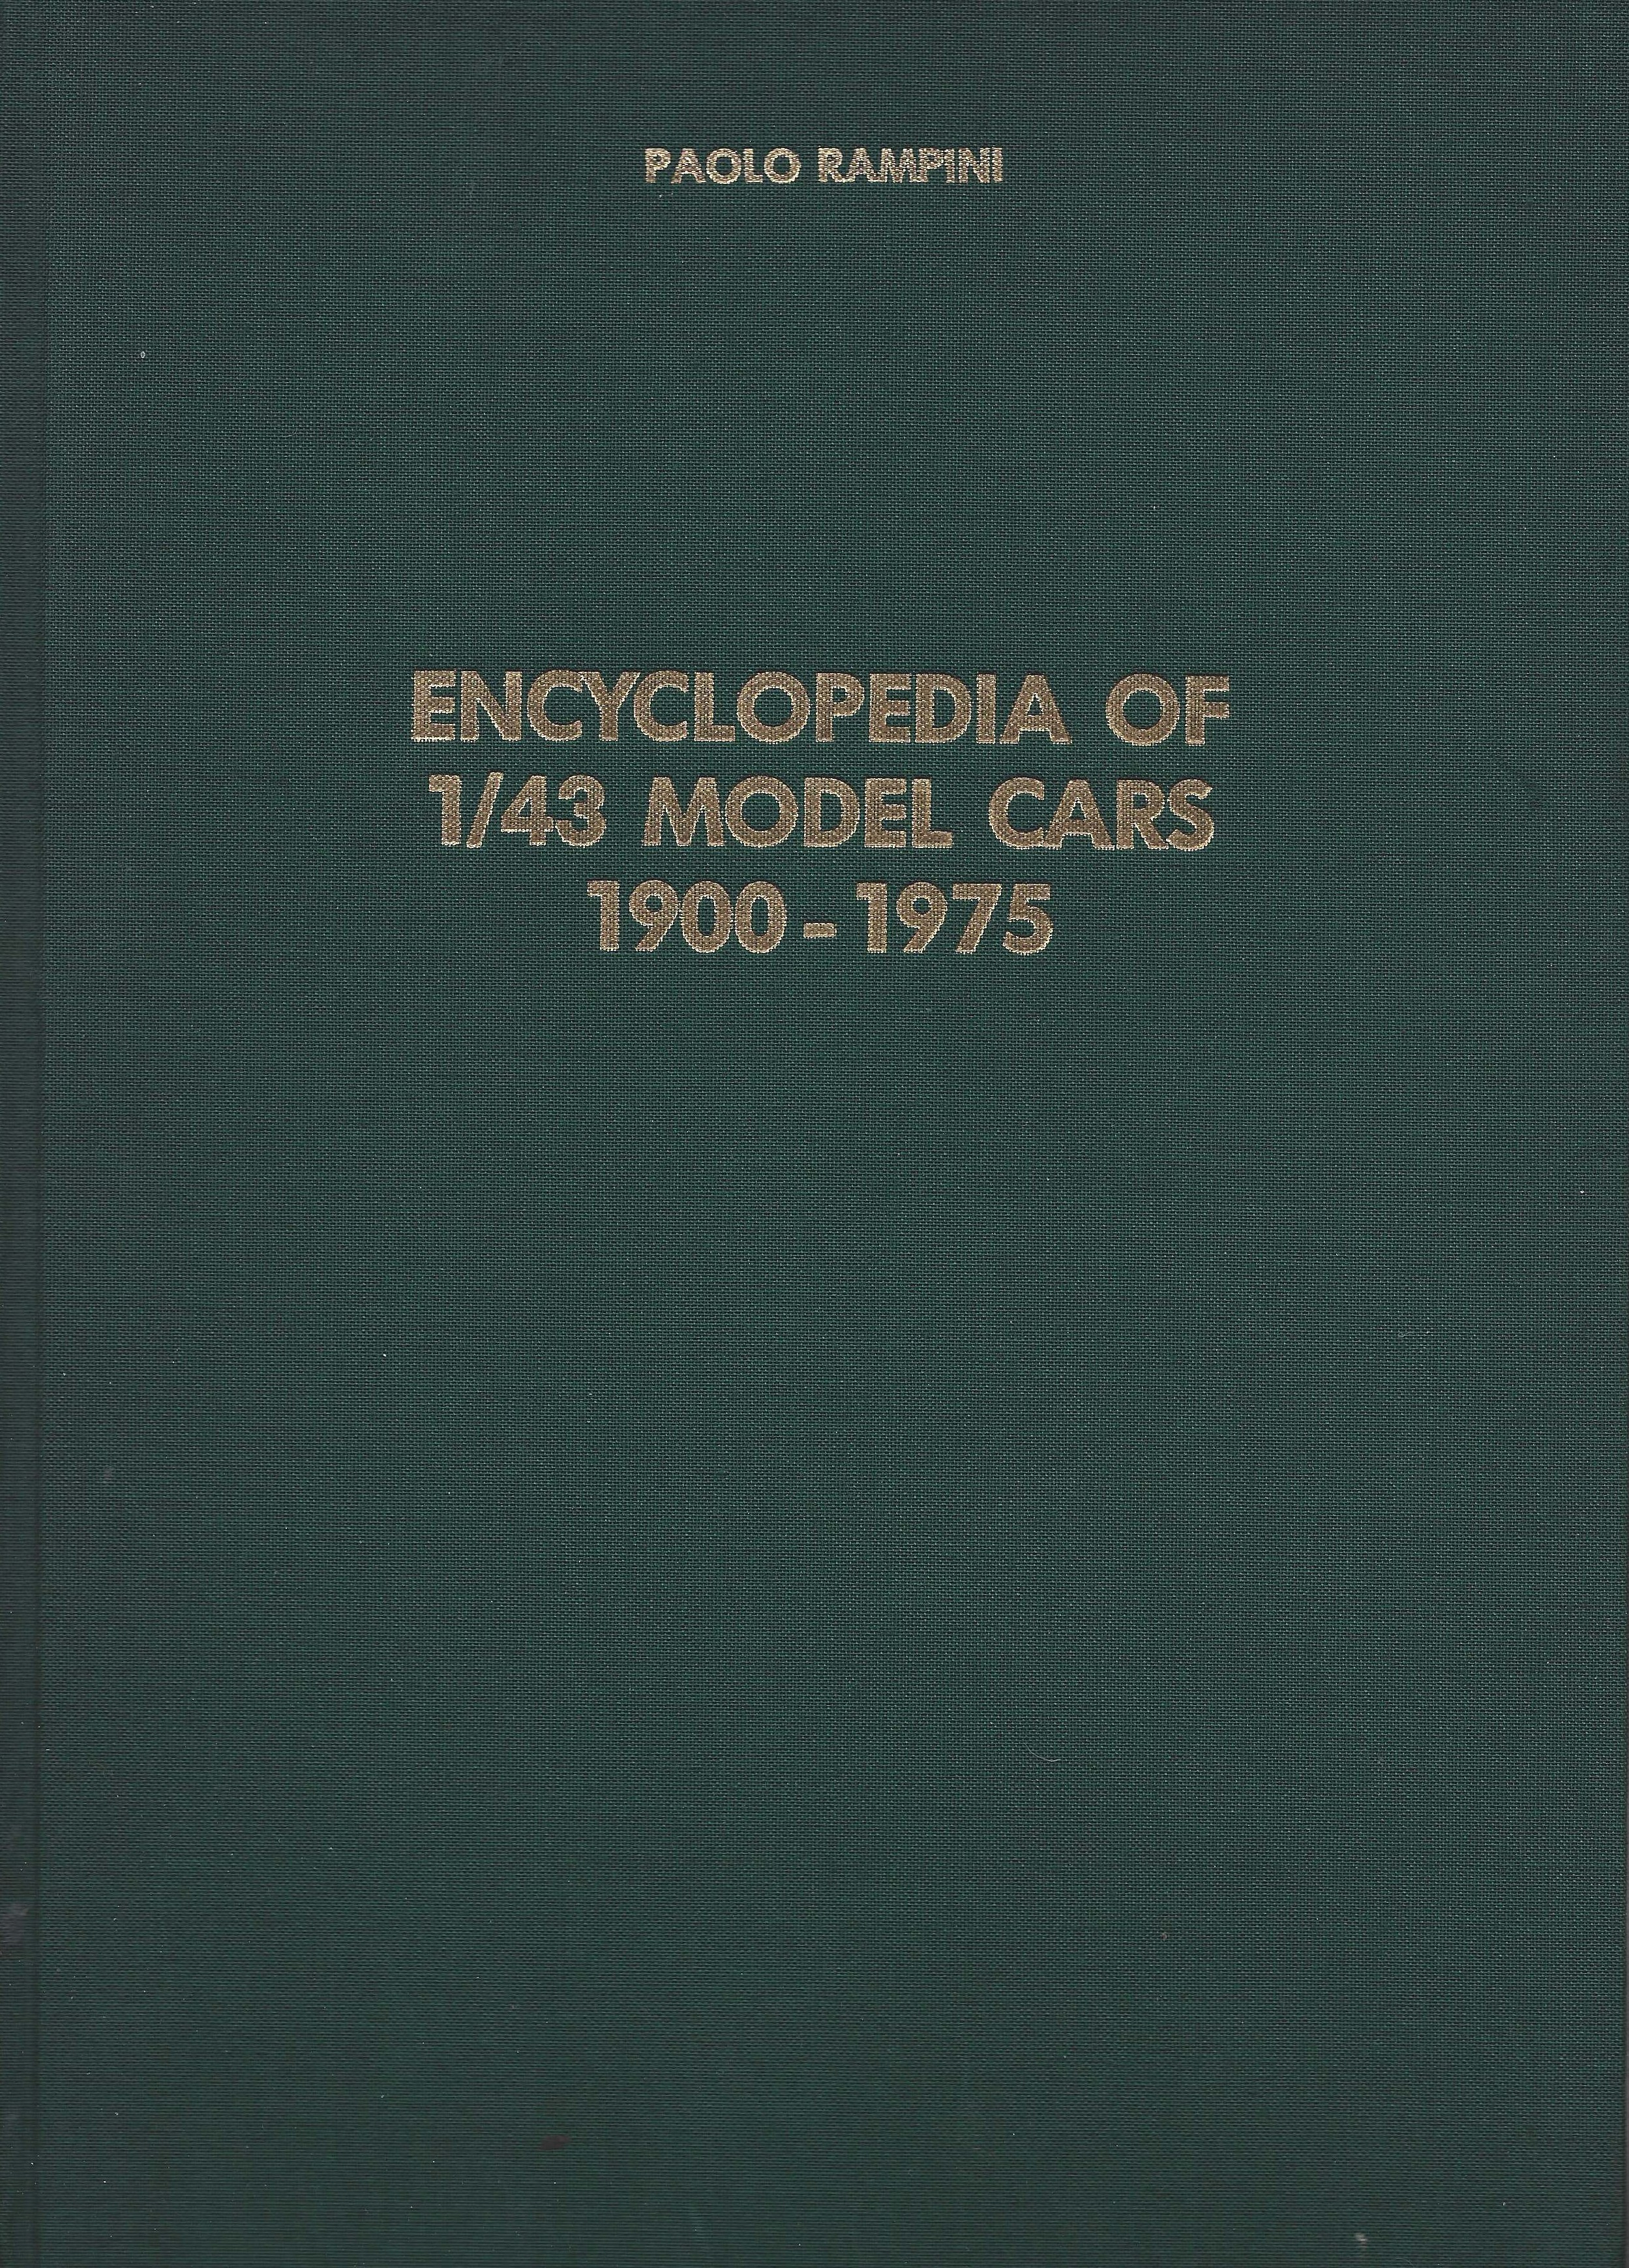 3 - Encyclopedia of 1:43 Model Cars 1900-1975, Milano, Edizioni Paolo Rampini, 1990